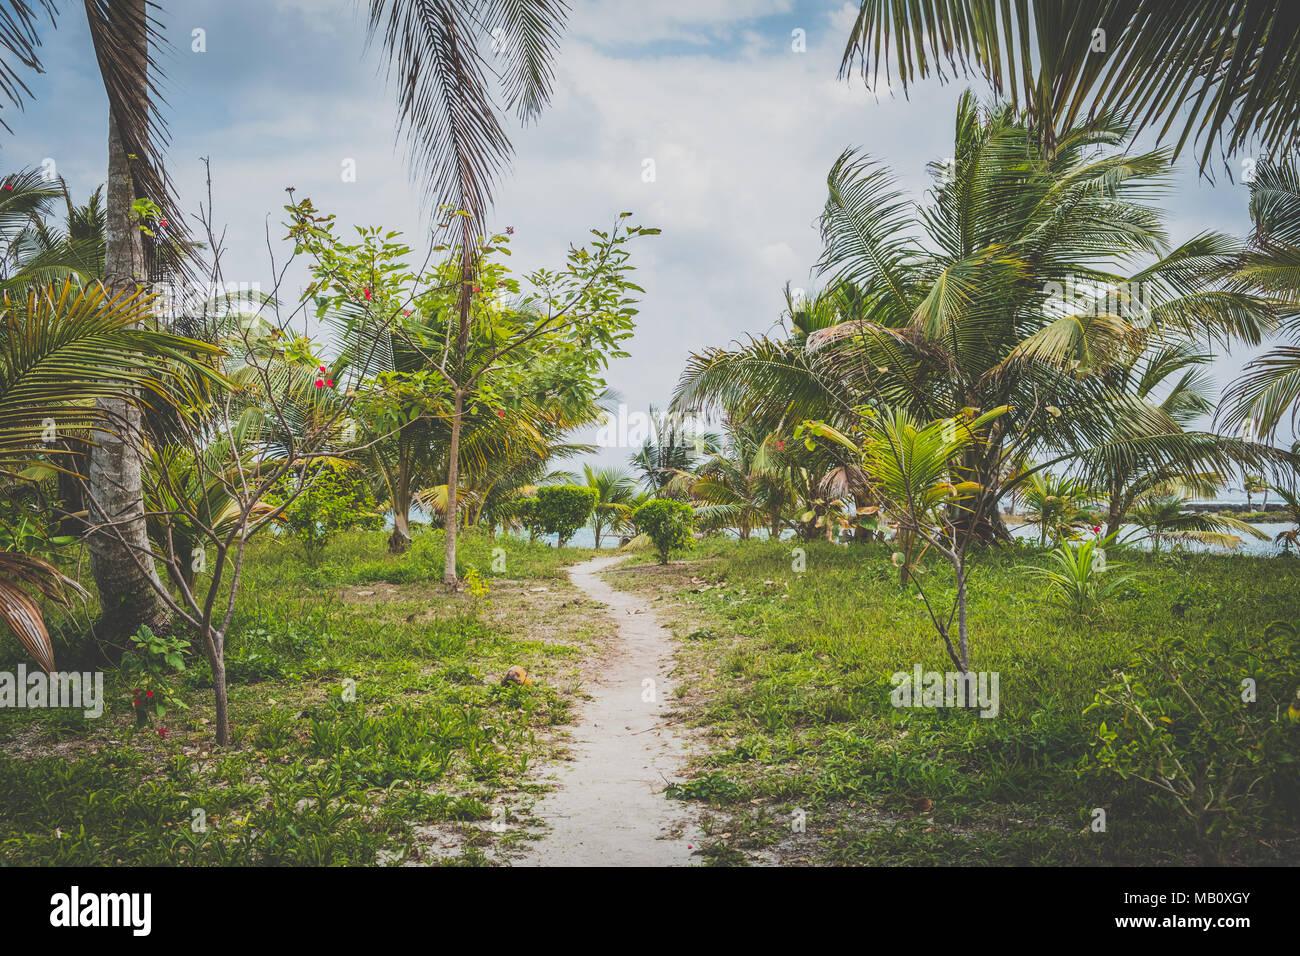 walking path, dirt trail, walkway through tropical garden  landscape, - Stock Image